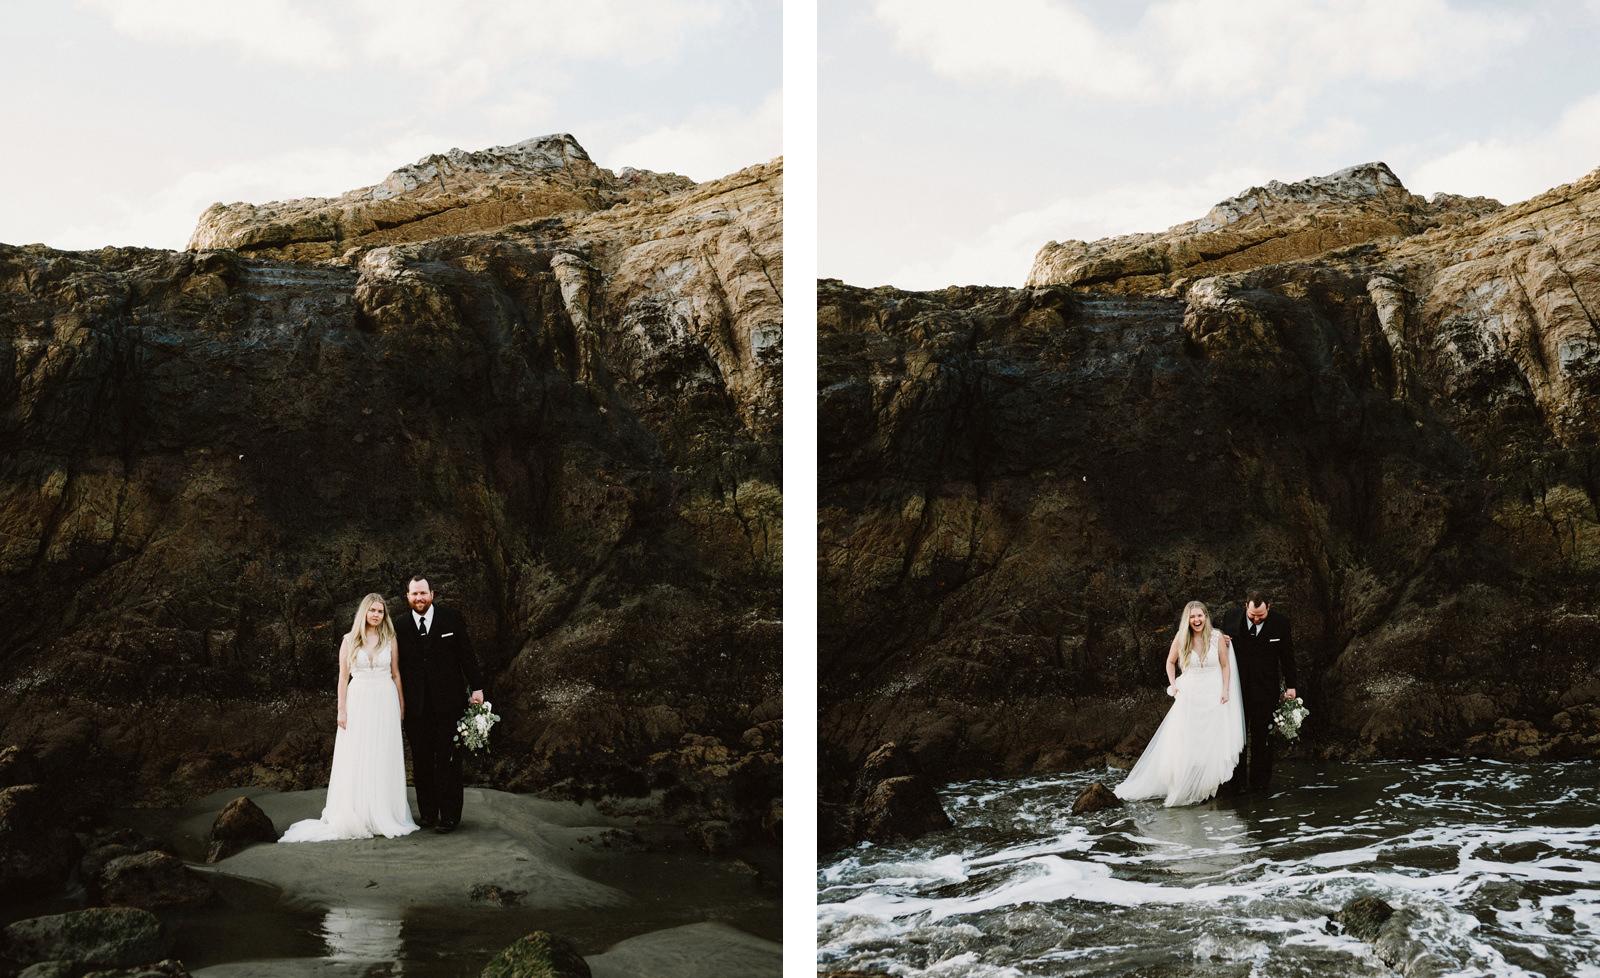 san-francisco-city-hall-elopement-49 SAN FRANCISCO CITY HALL INTIMATE WEDDING